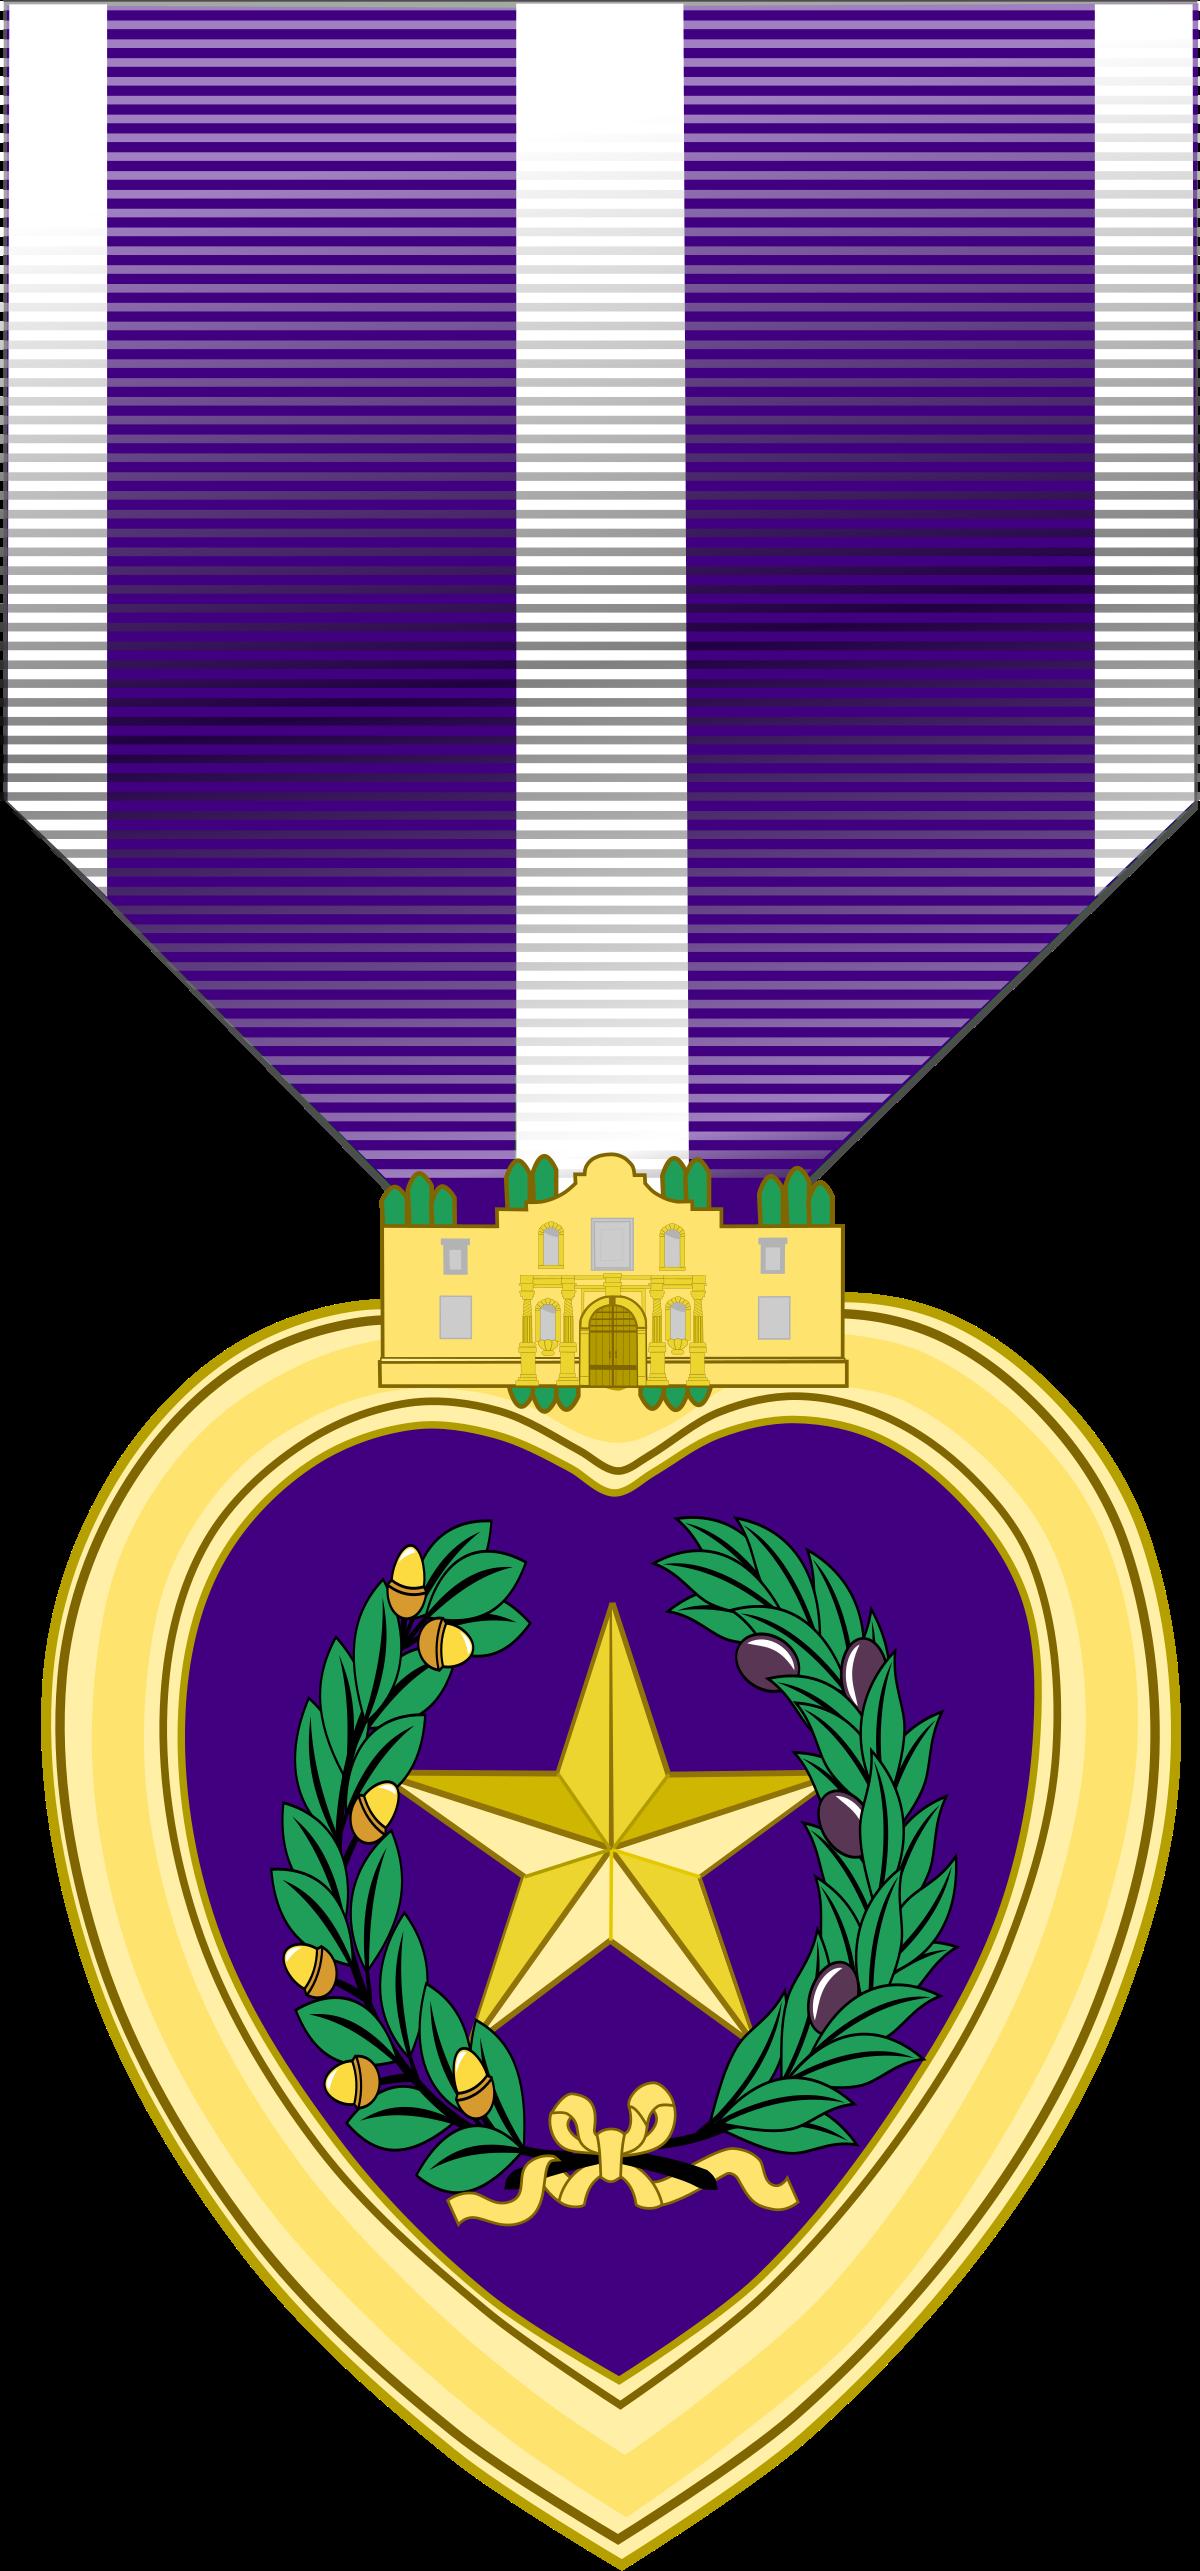 Military purple heart clipart transparent stock Texas Purple Heart Medal - Wikipedia transparent stock